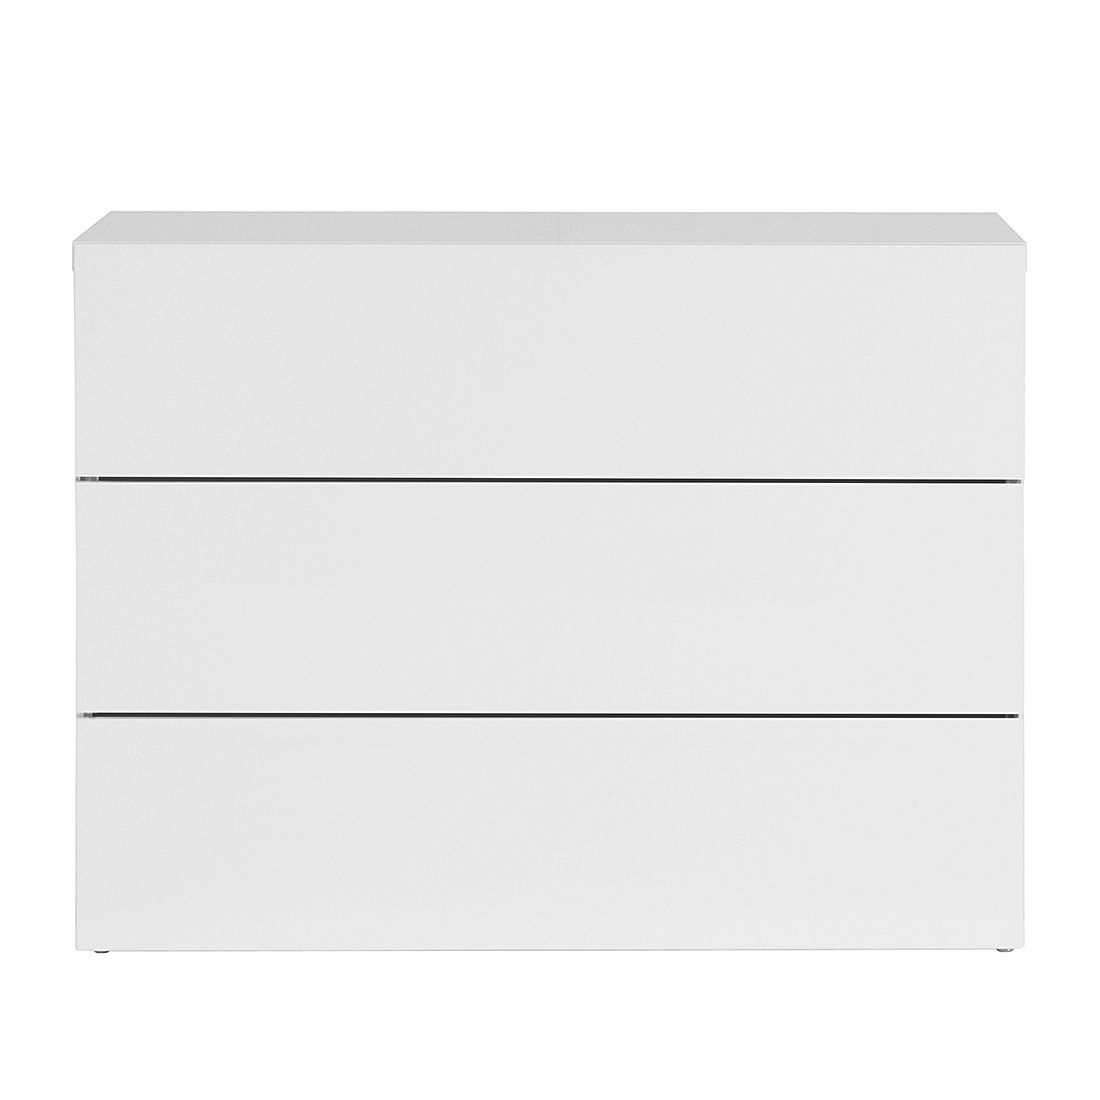 Kommode Aurora I – Matt Weiß, temahome kaufen